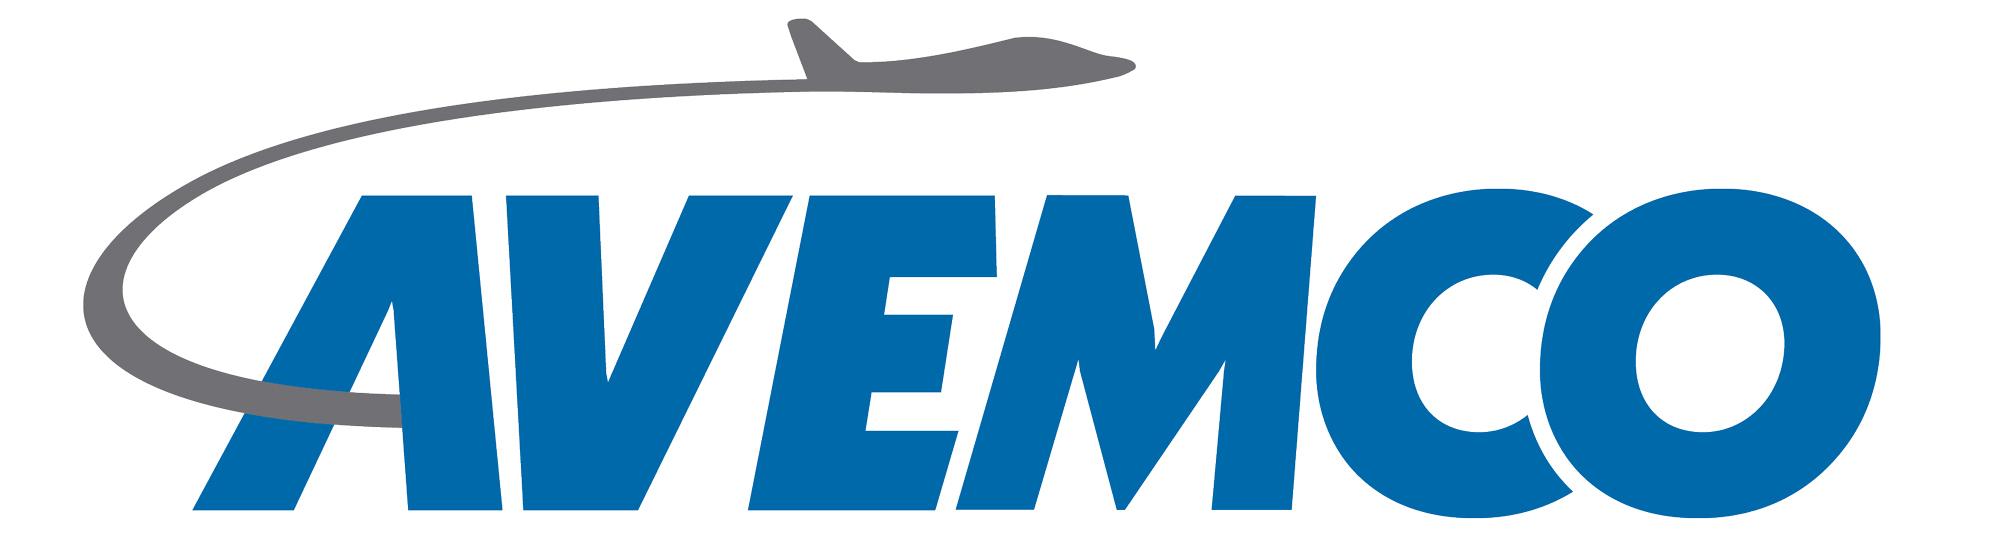 AVEMCO logo